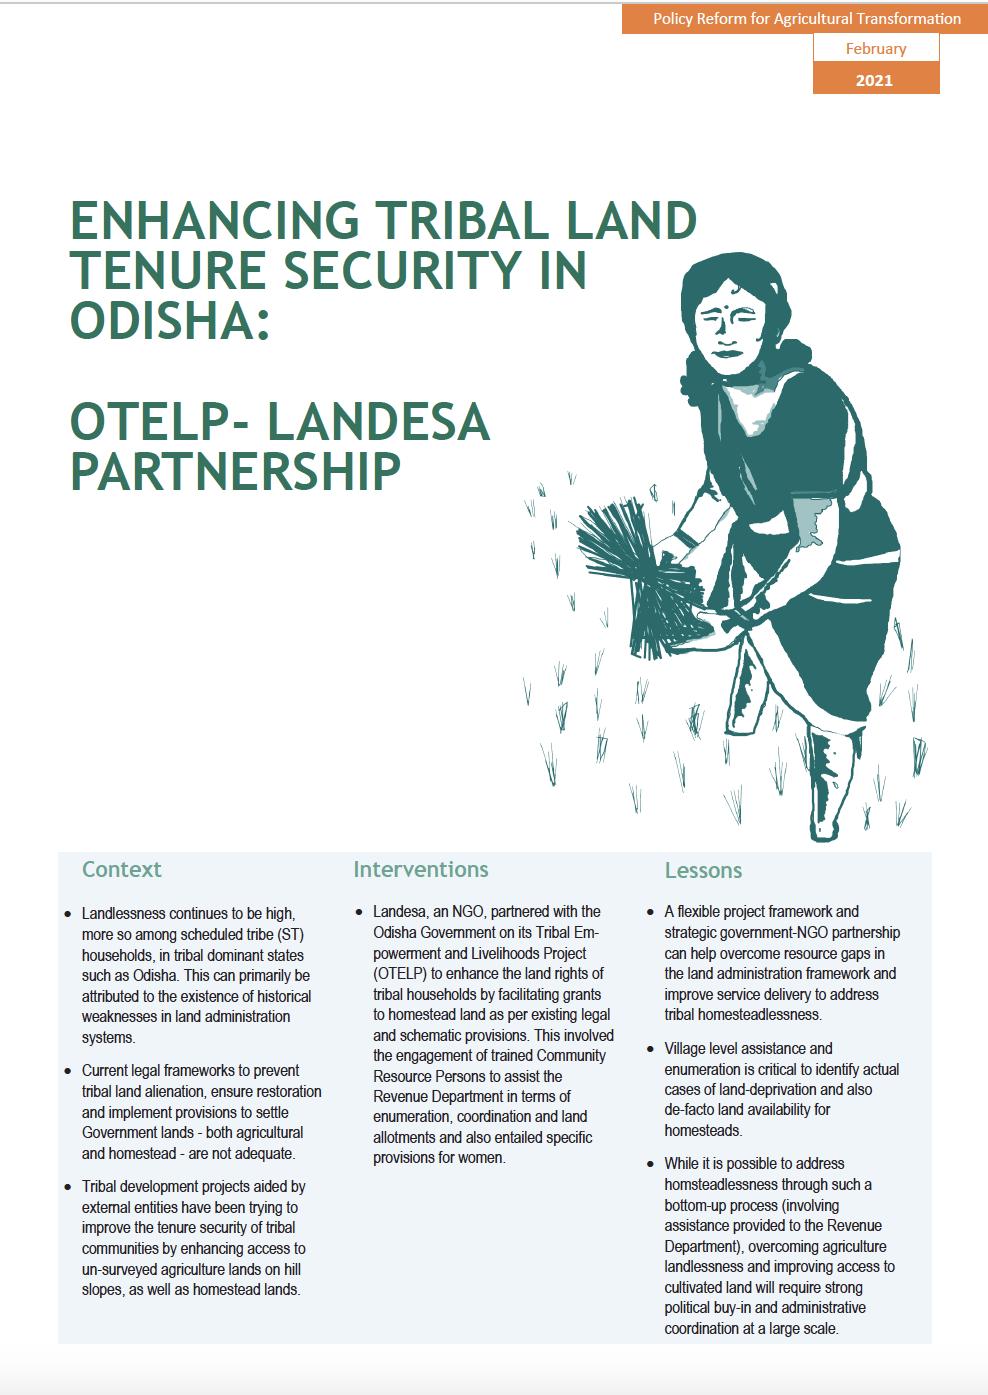 Enhancing Tribal Land Tenure Security in Odisha